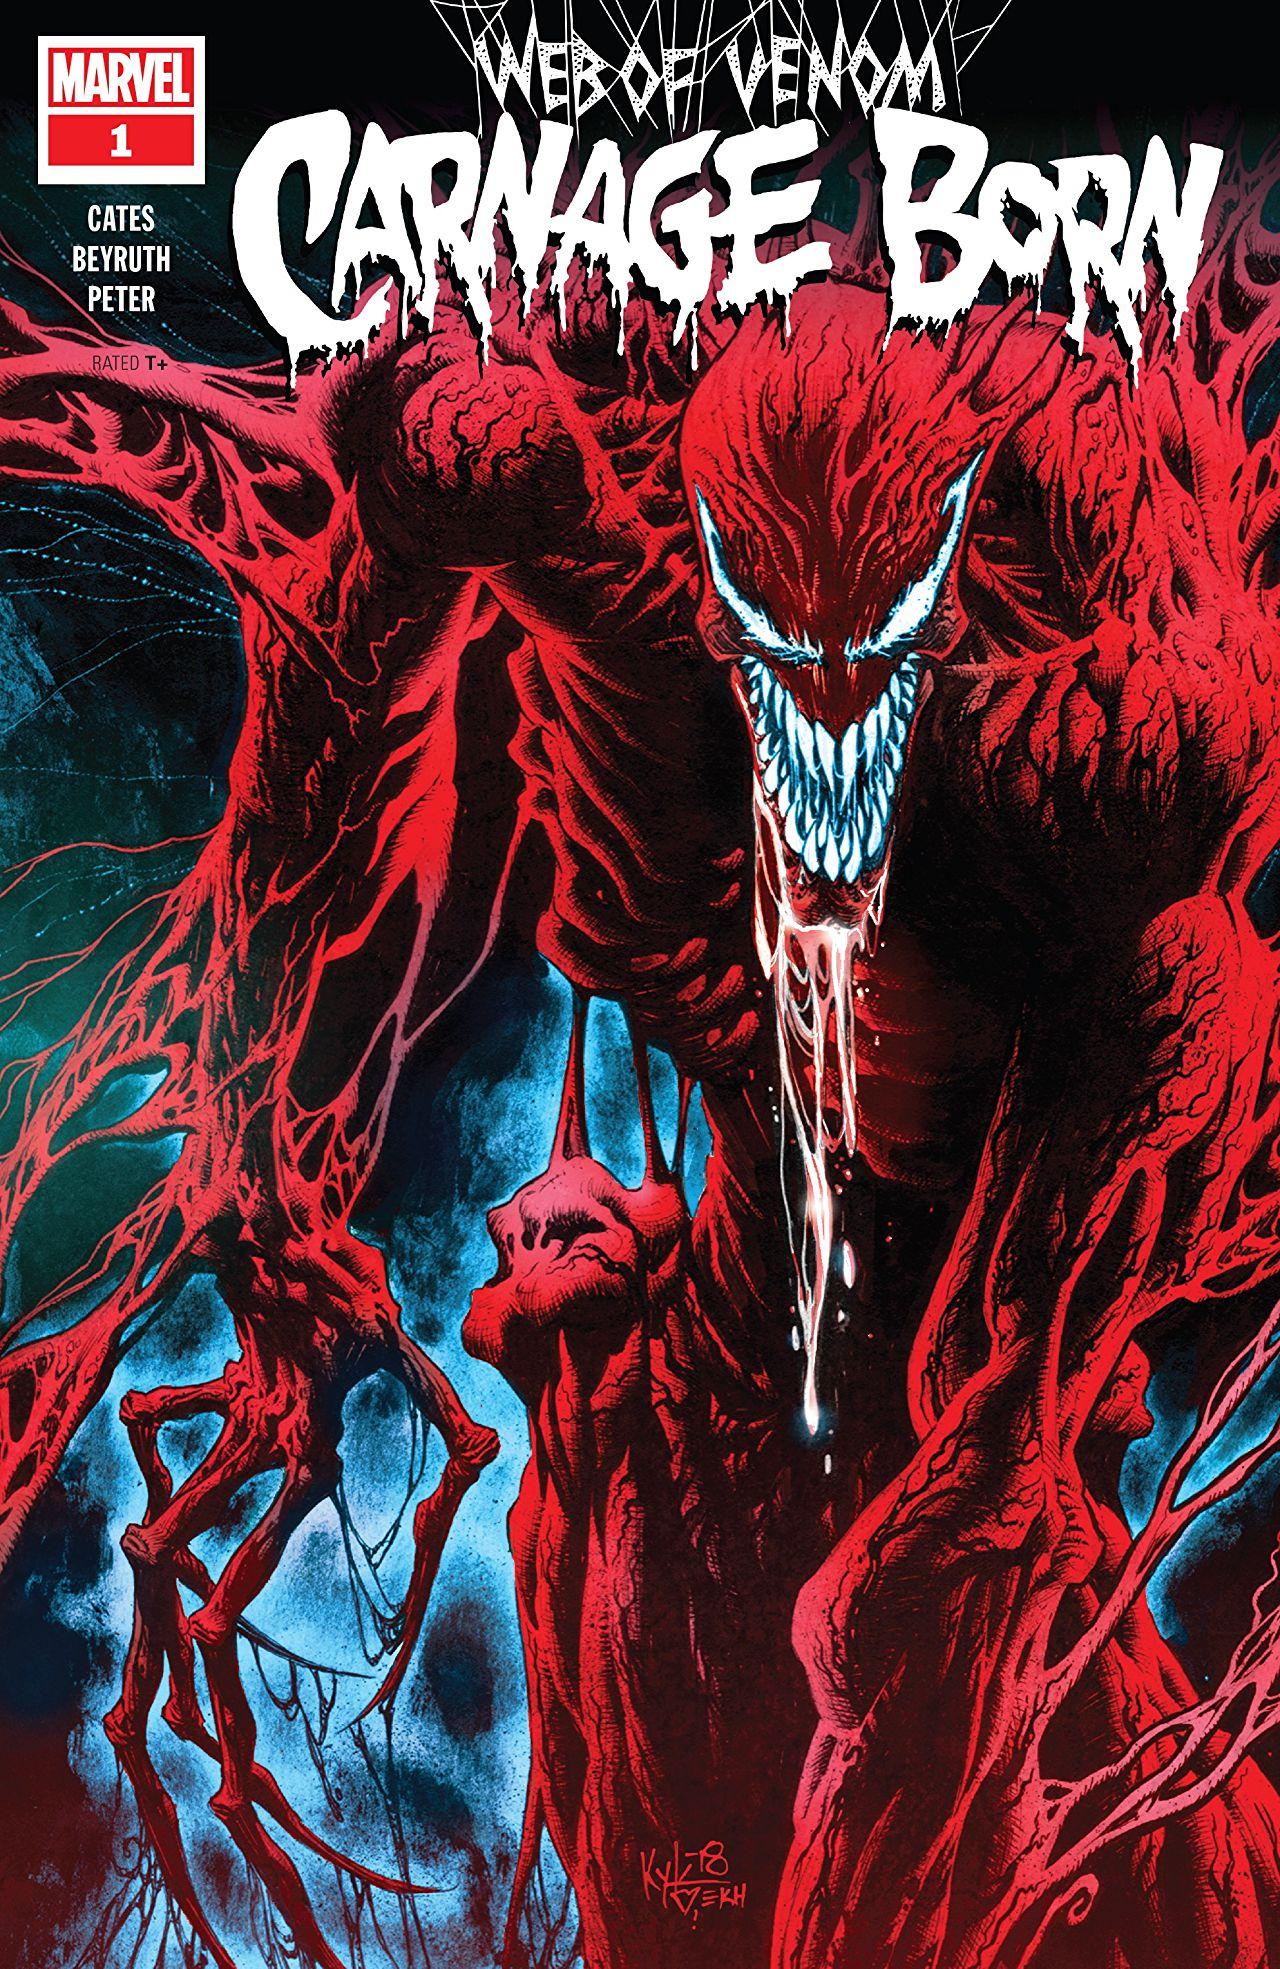 Web of Venom: Carnage Born Vol 1 1 | Marvel Database ...